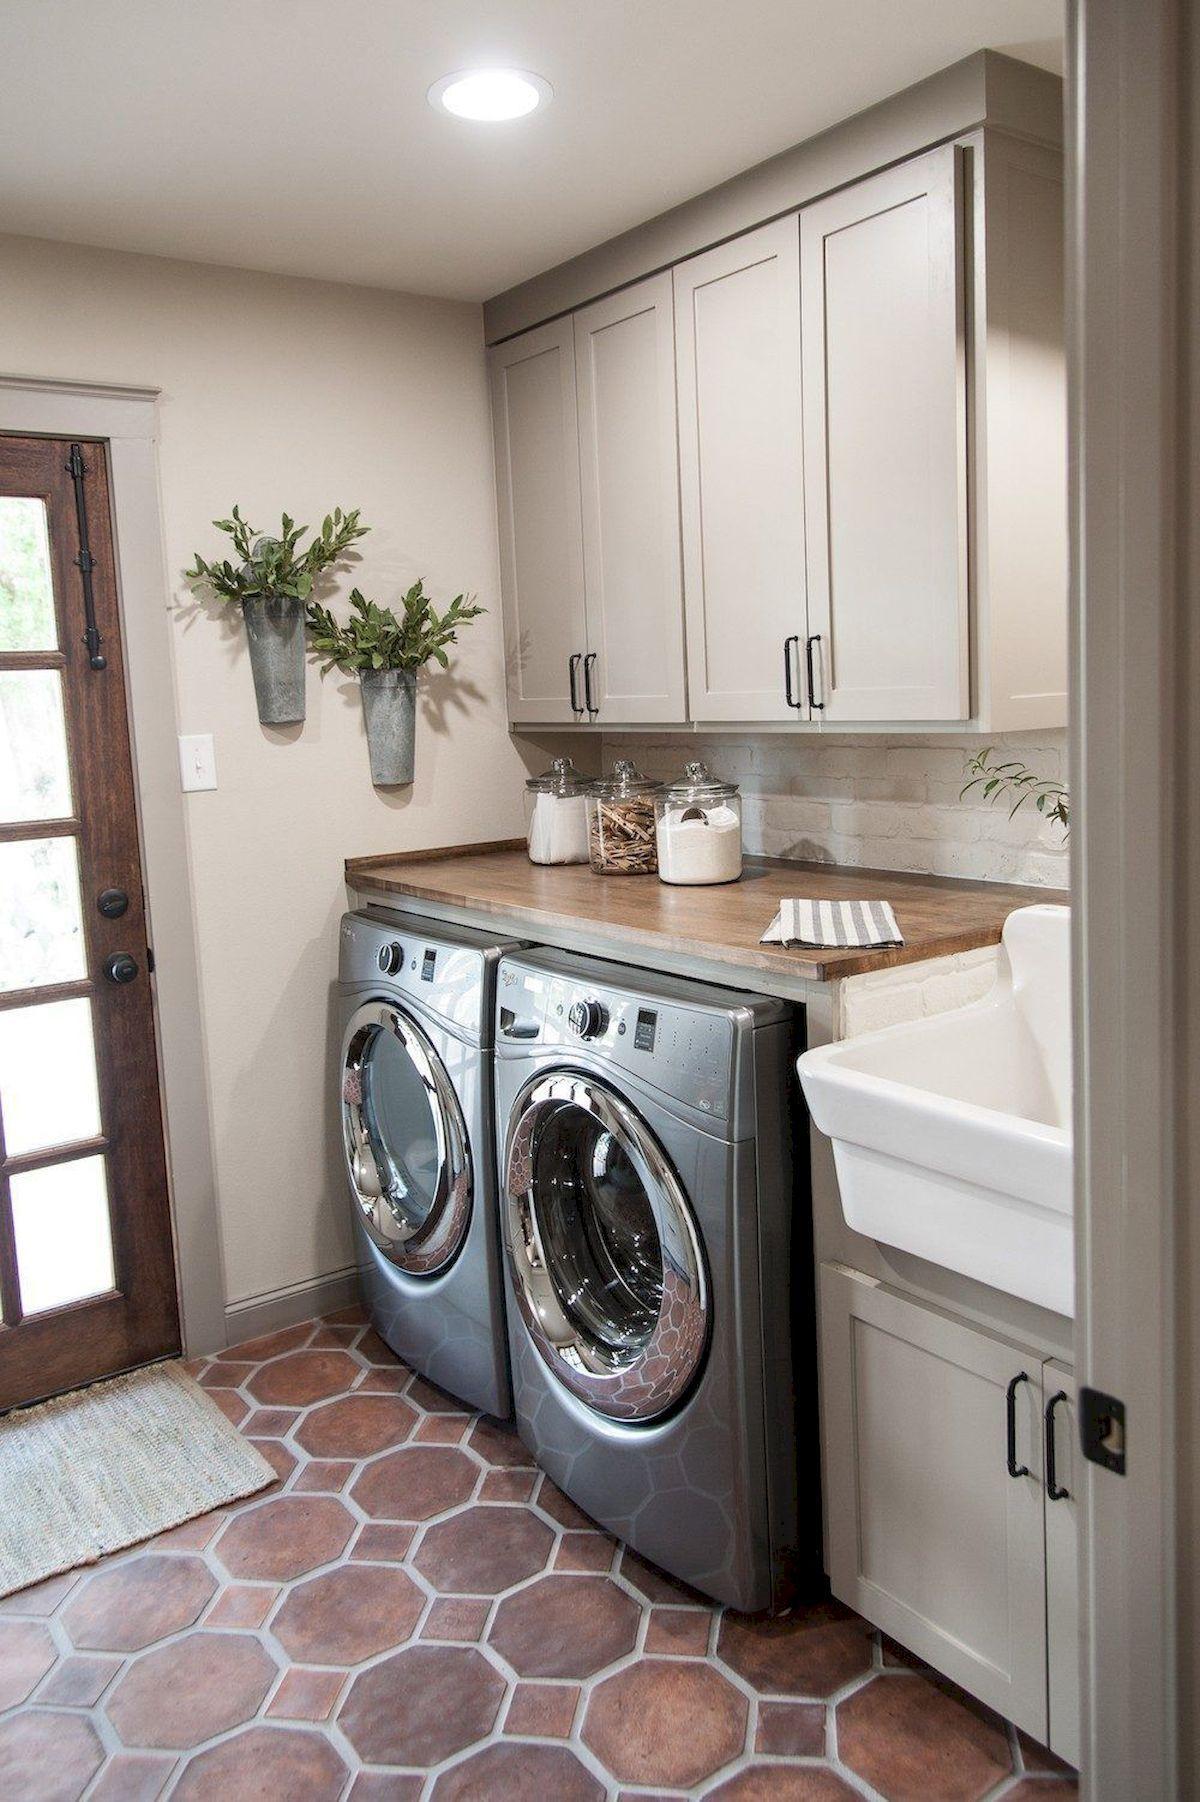 55 Best Small Laundry Room Photo Storage Ideas 38 Laundry